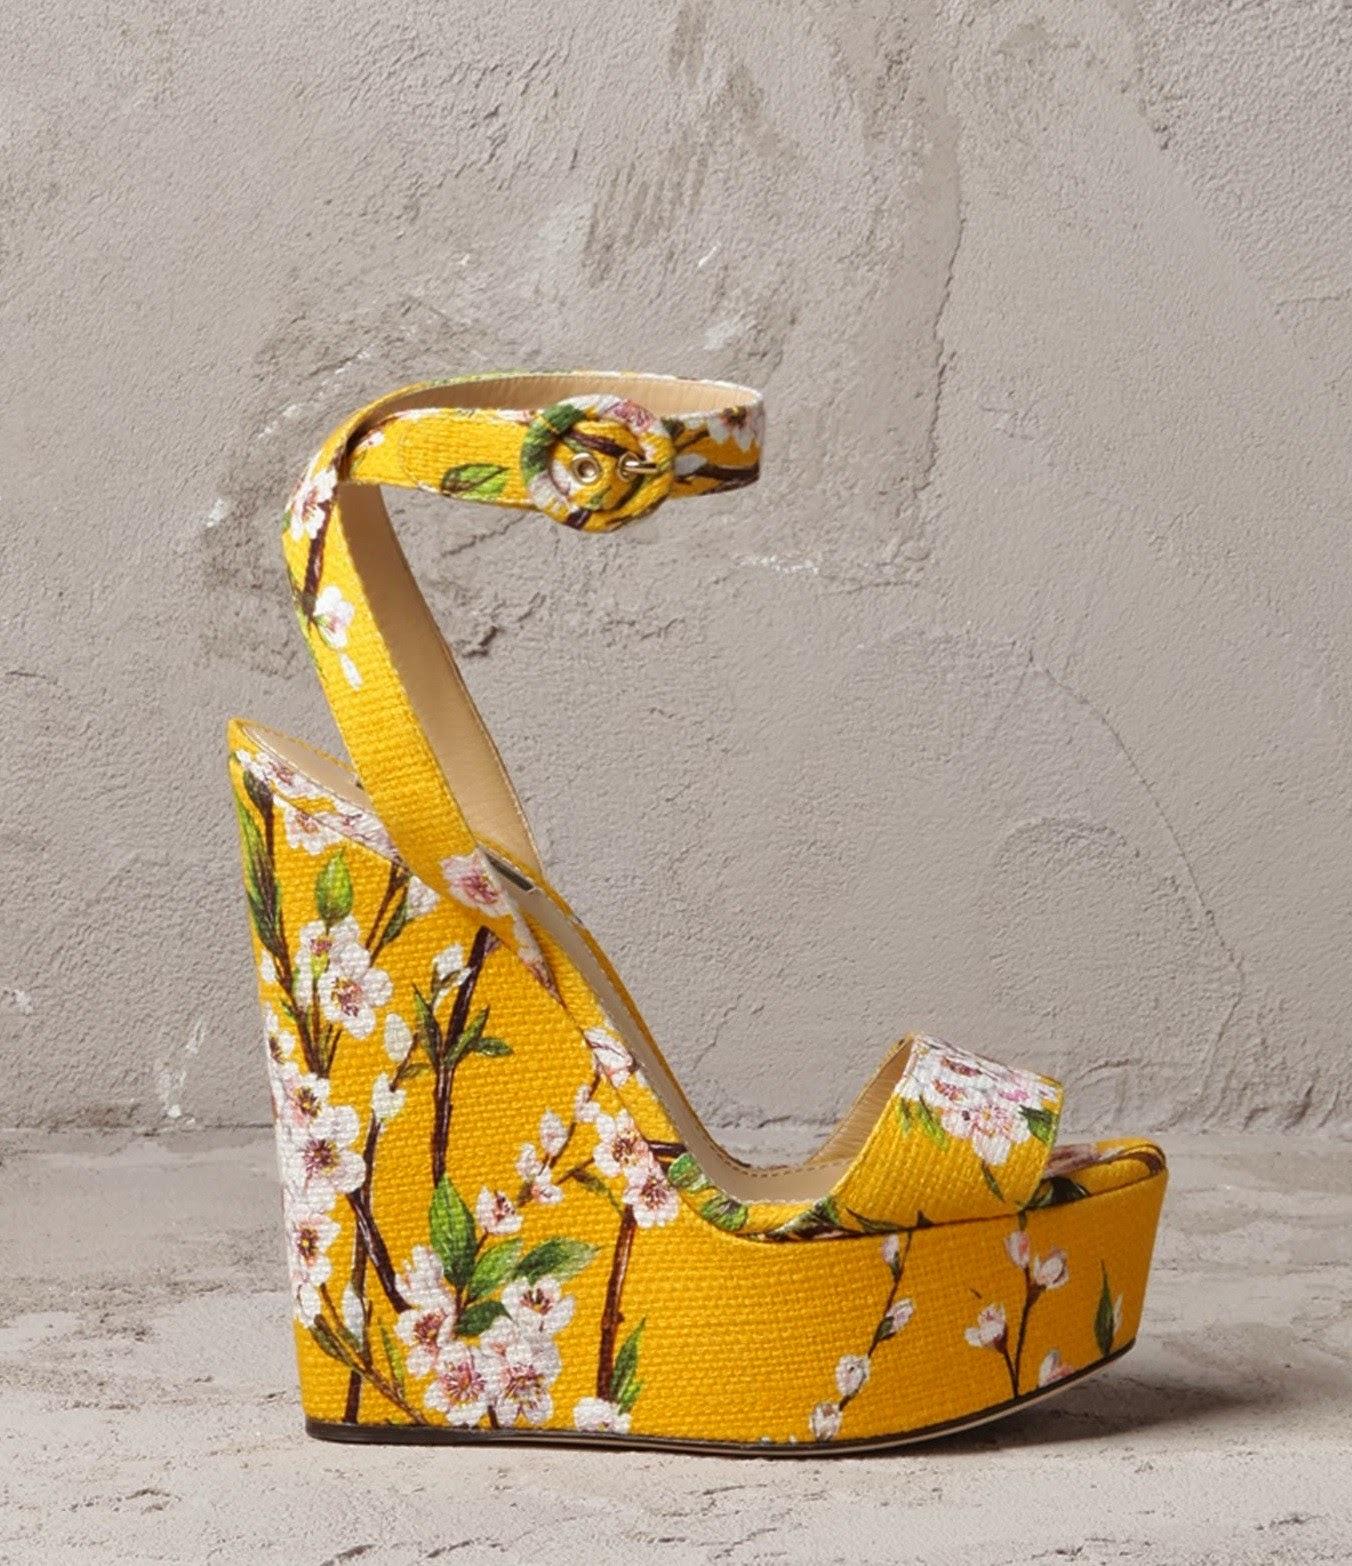 http://www.mustglamour.tv/en/dolce-and-gabbana-shoes-springsummer-2014/